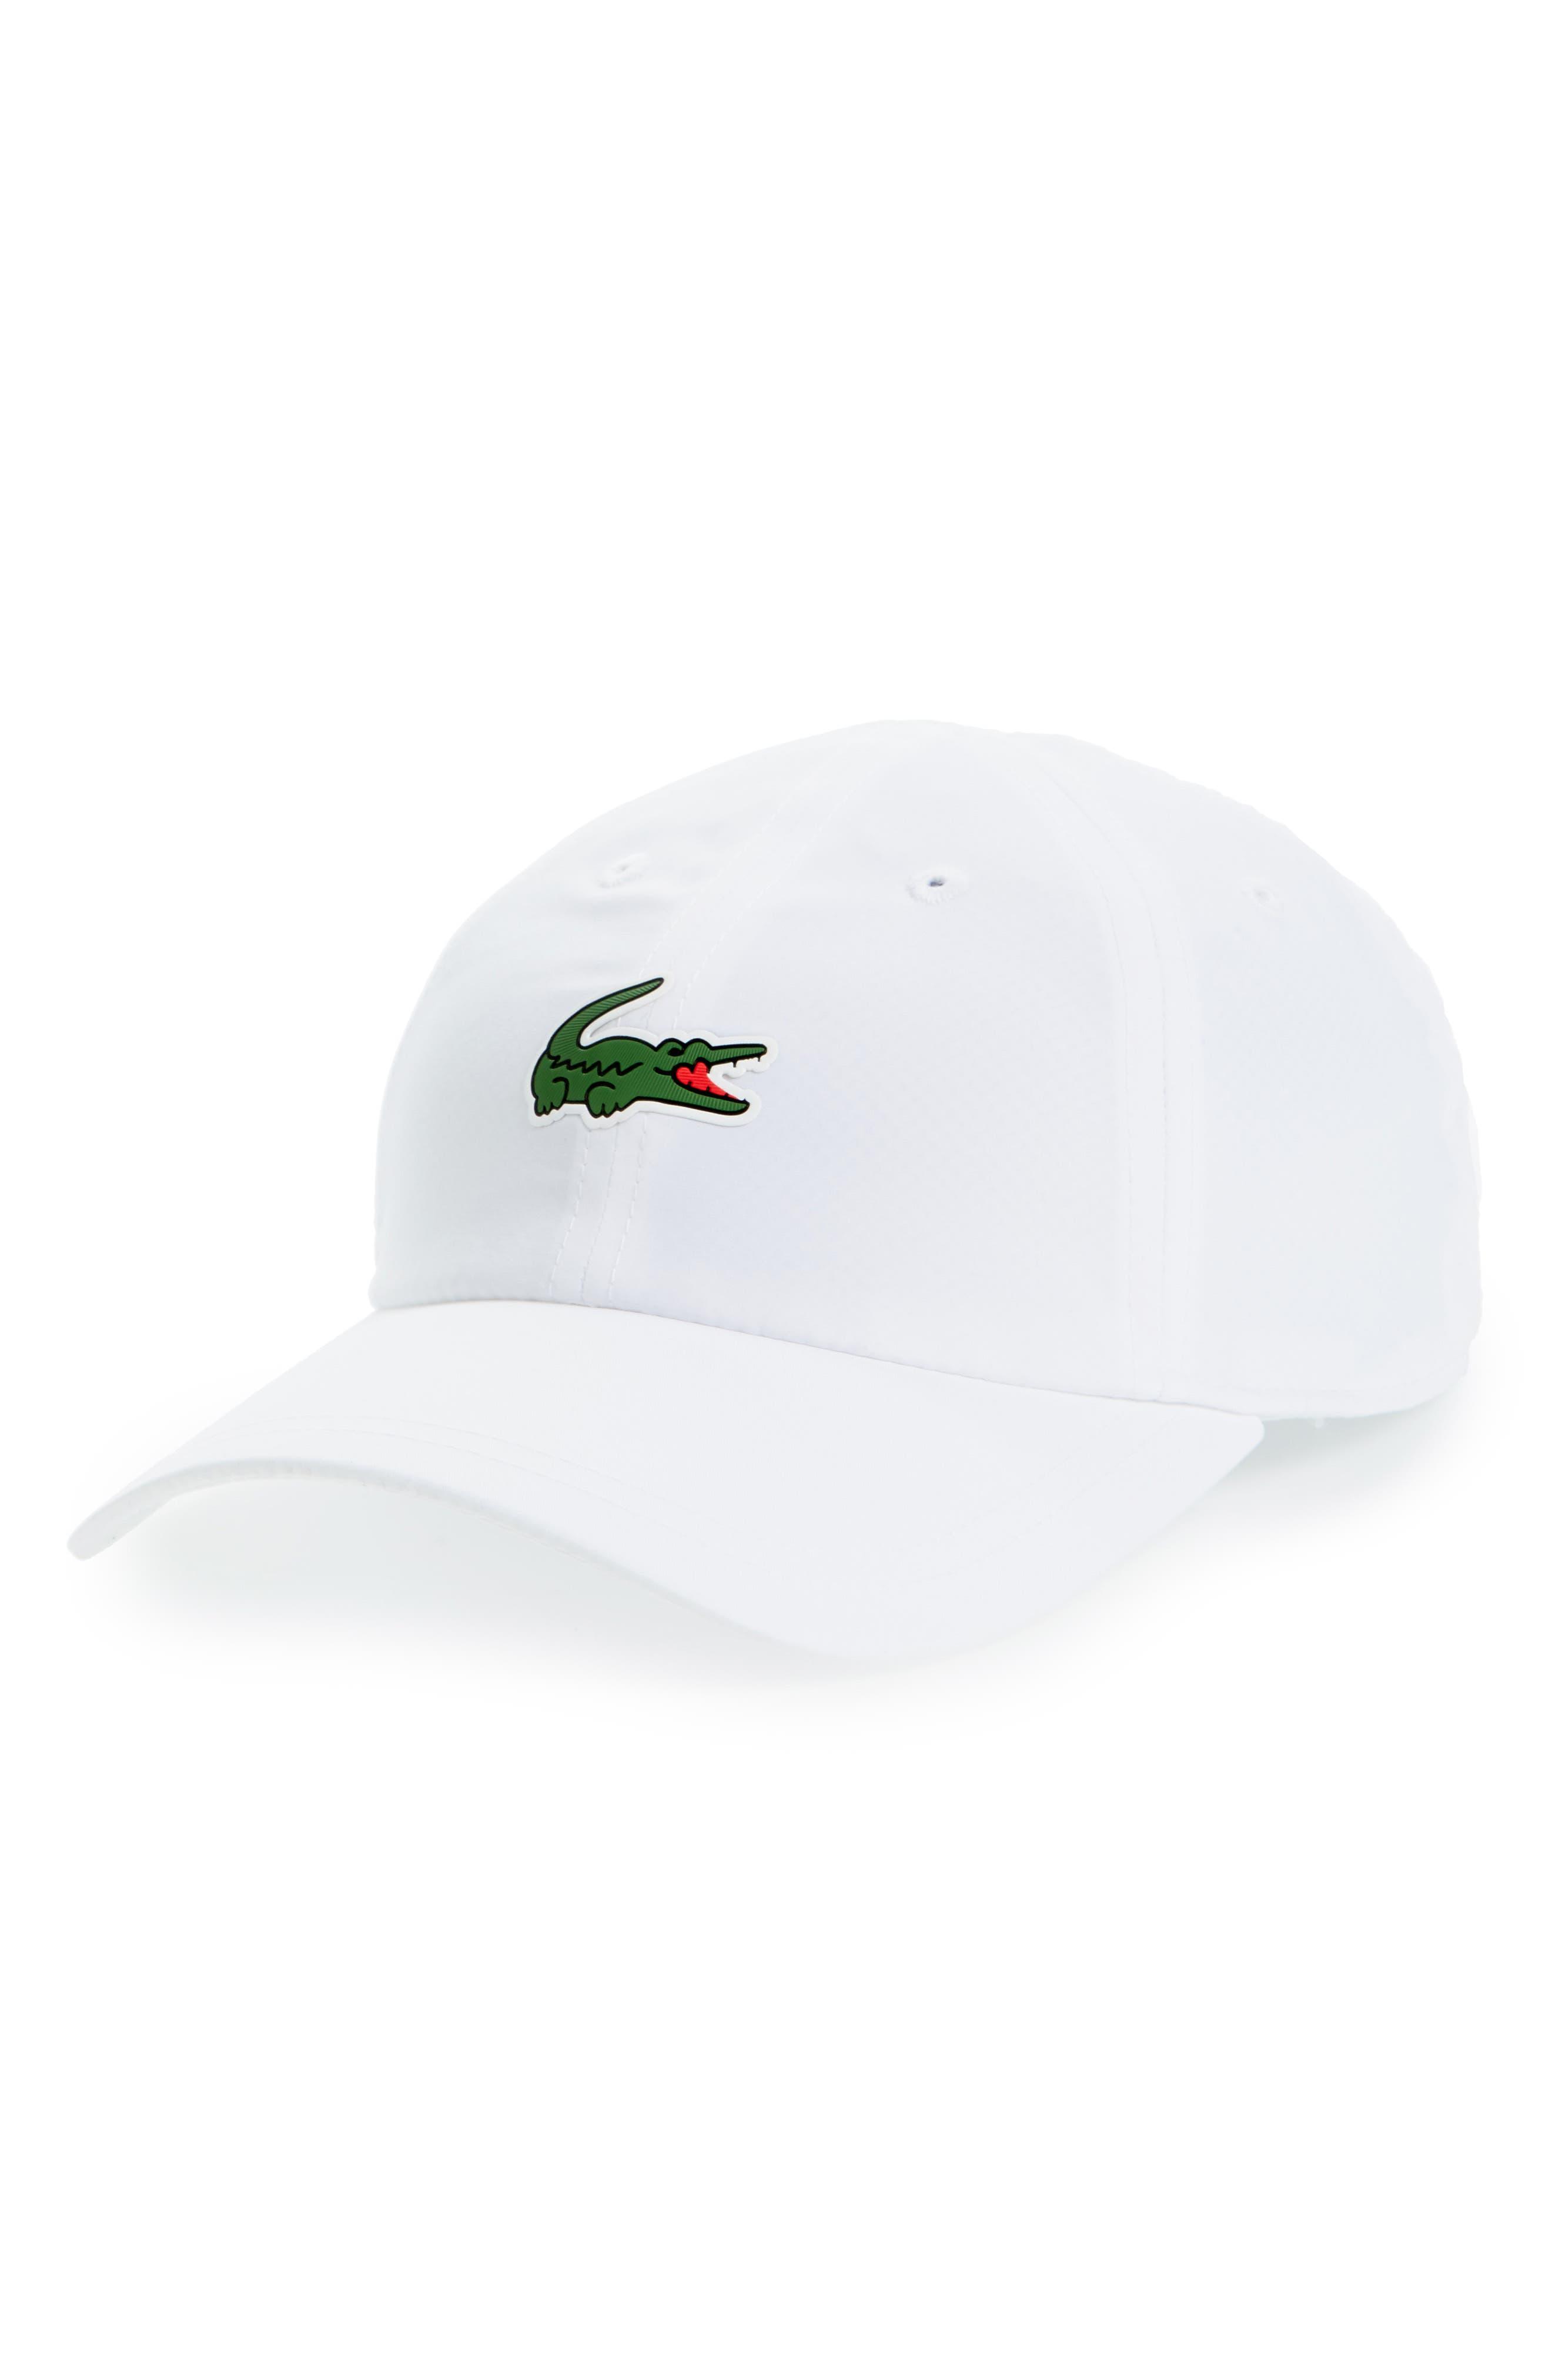 Lacoste Sport Croc Cap - White  b12c64b31194